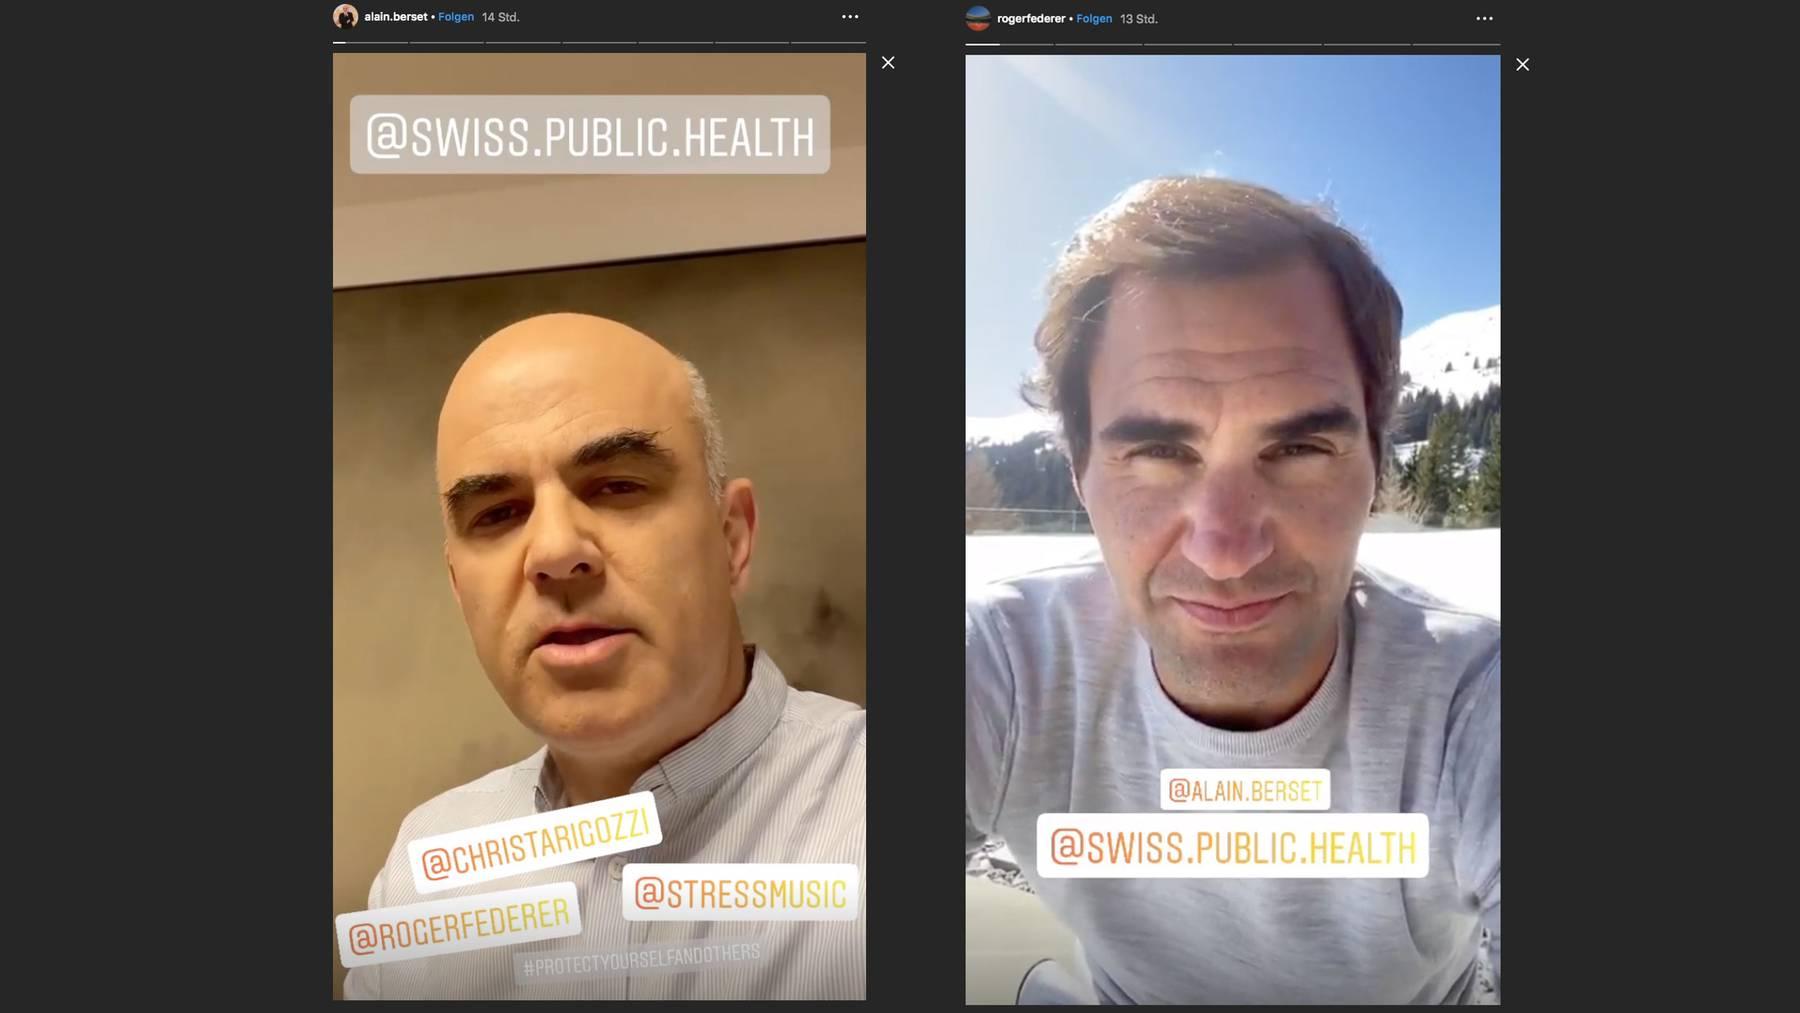 Federer_Berset